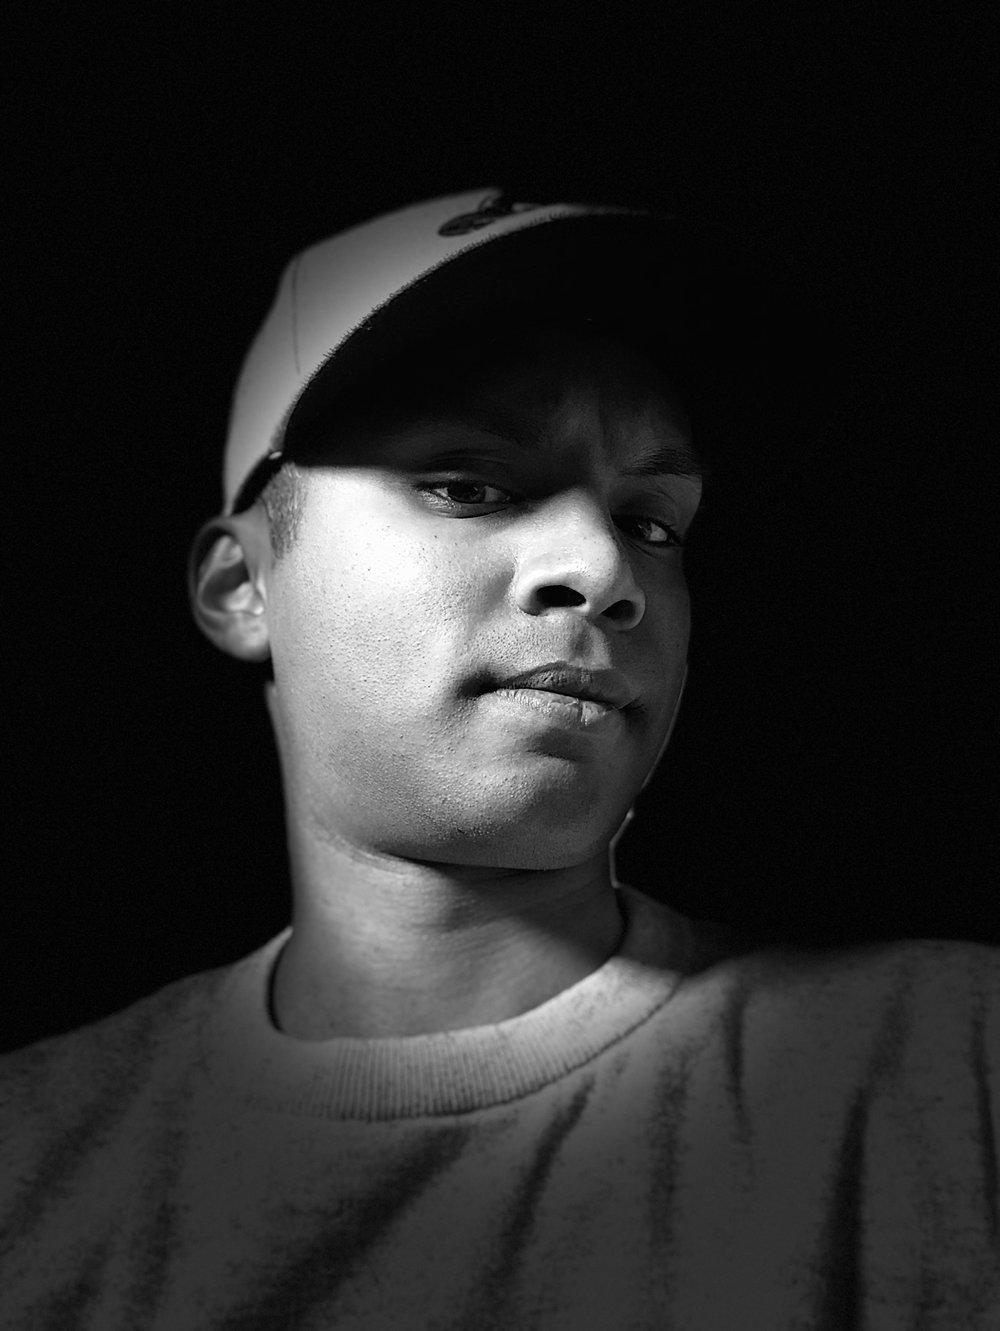 Here's a portrait taken on the front facing camera using Studio Light Mono lighting.